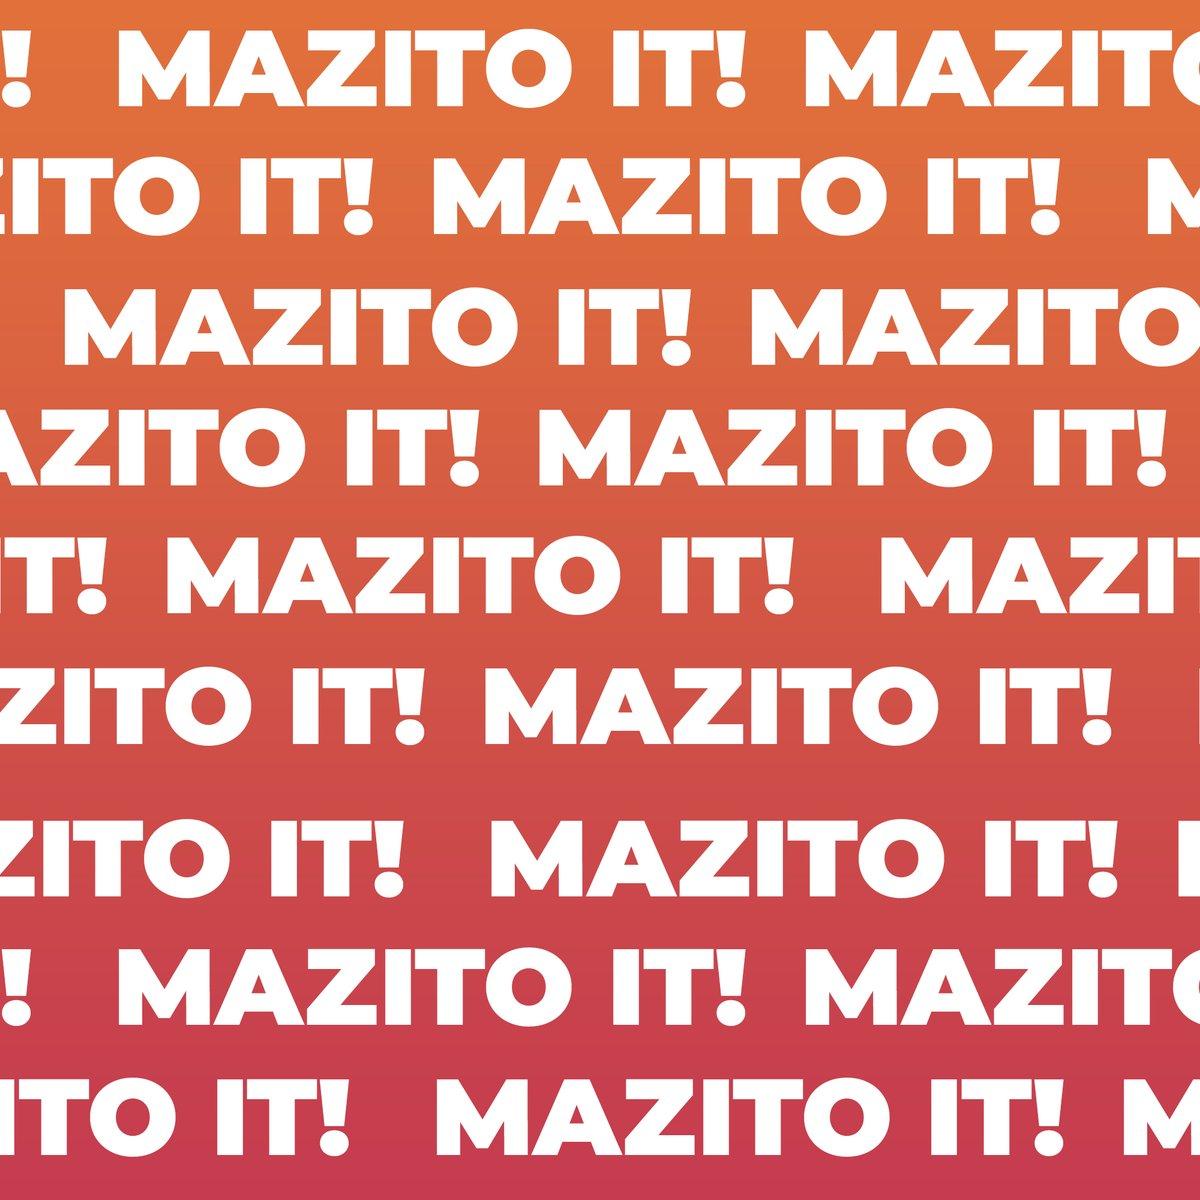 Just Mazito It!   #mazitoit #mazitoworld #mazito #pets #animallover #PetsAreTheBest #Dogs #Cats #Animals